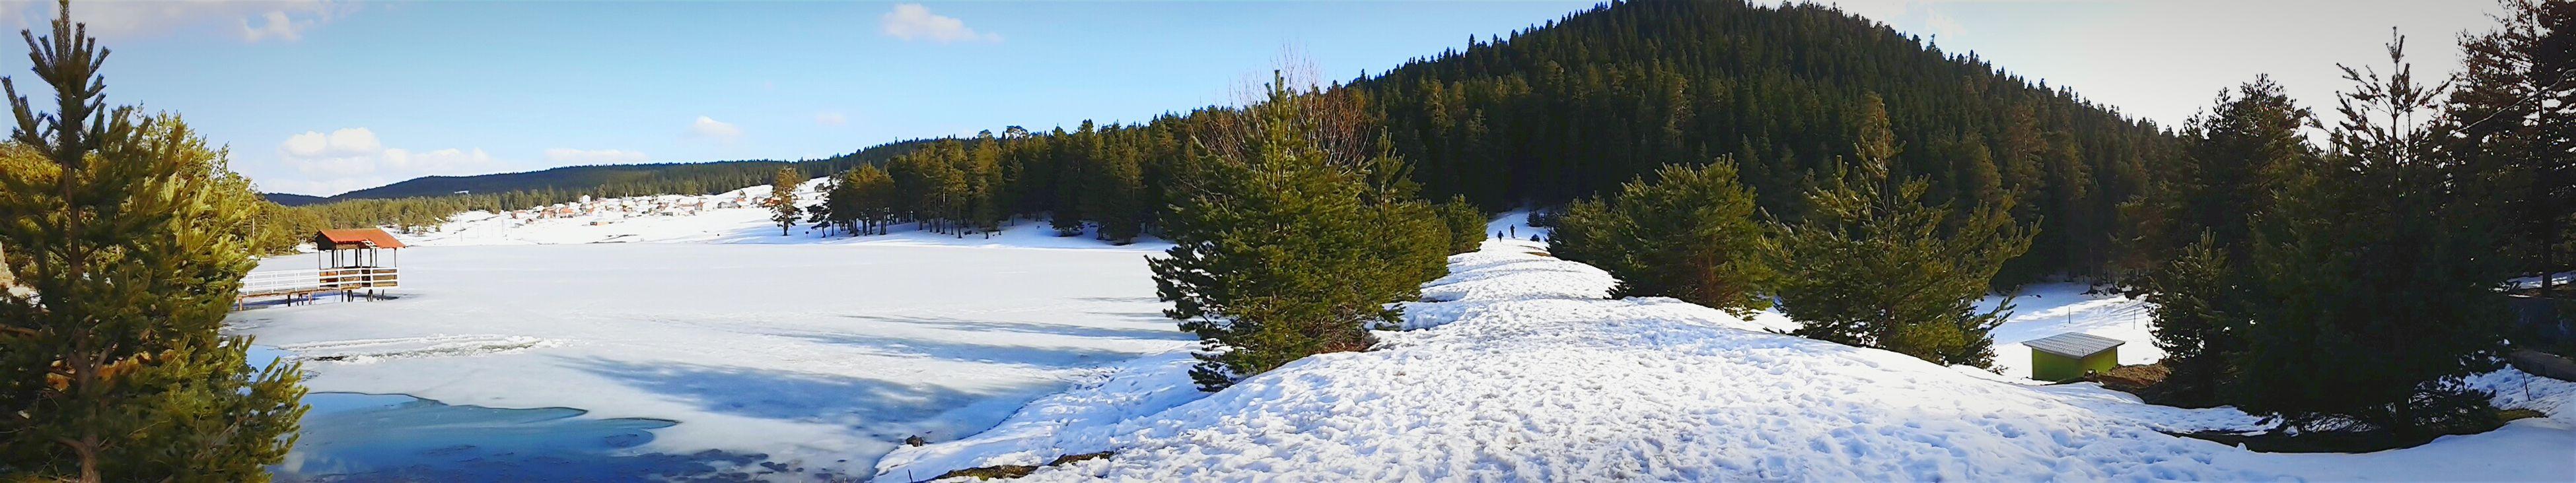 Snowwhite Snow❄⛄ Manzara Agaclar Hello World Trees Natural Sunyshine Beautiful Nature Taking Photos #bolu # saraycik yaylası